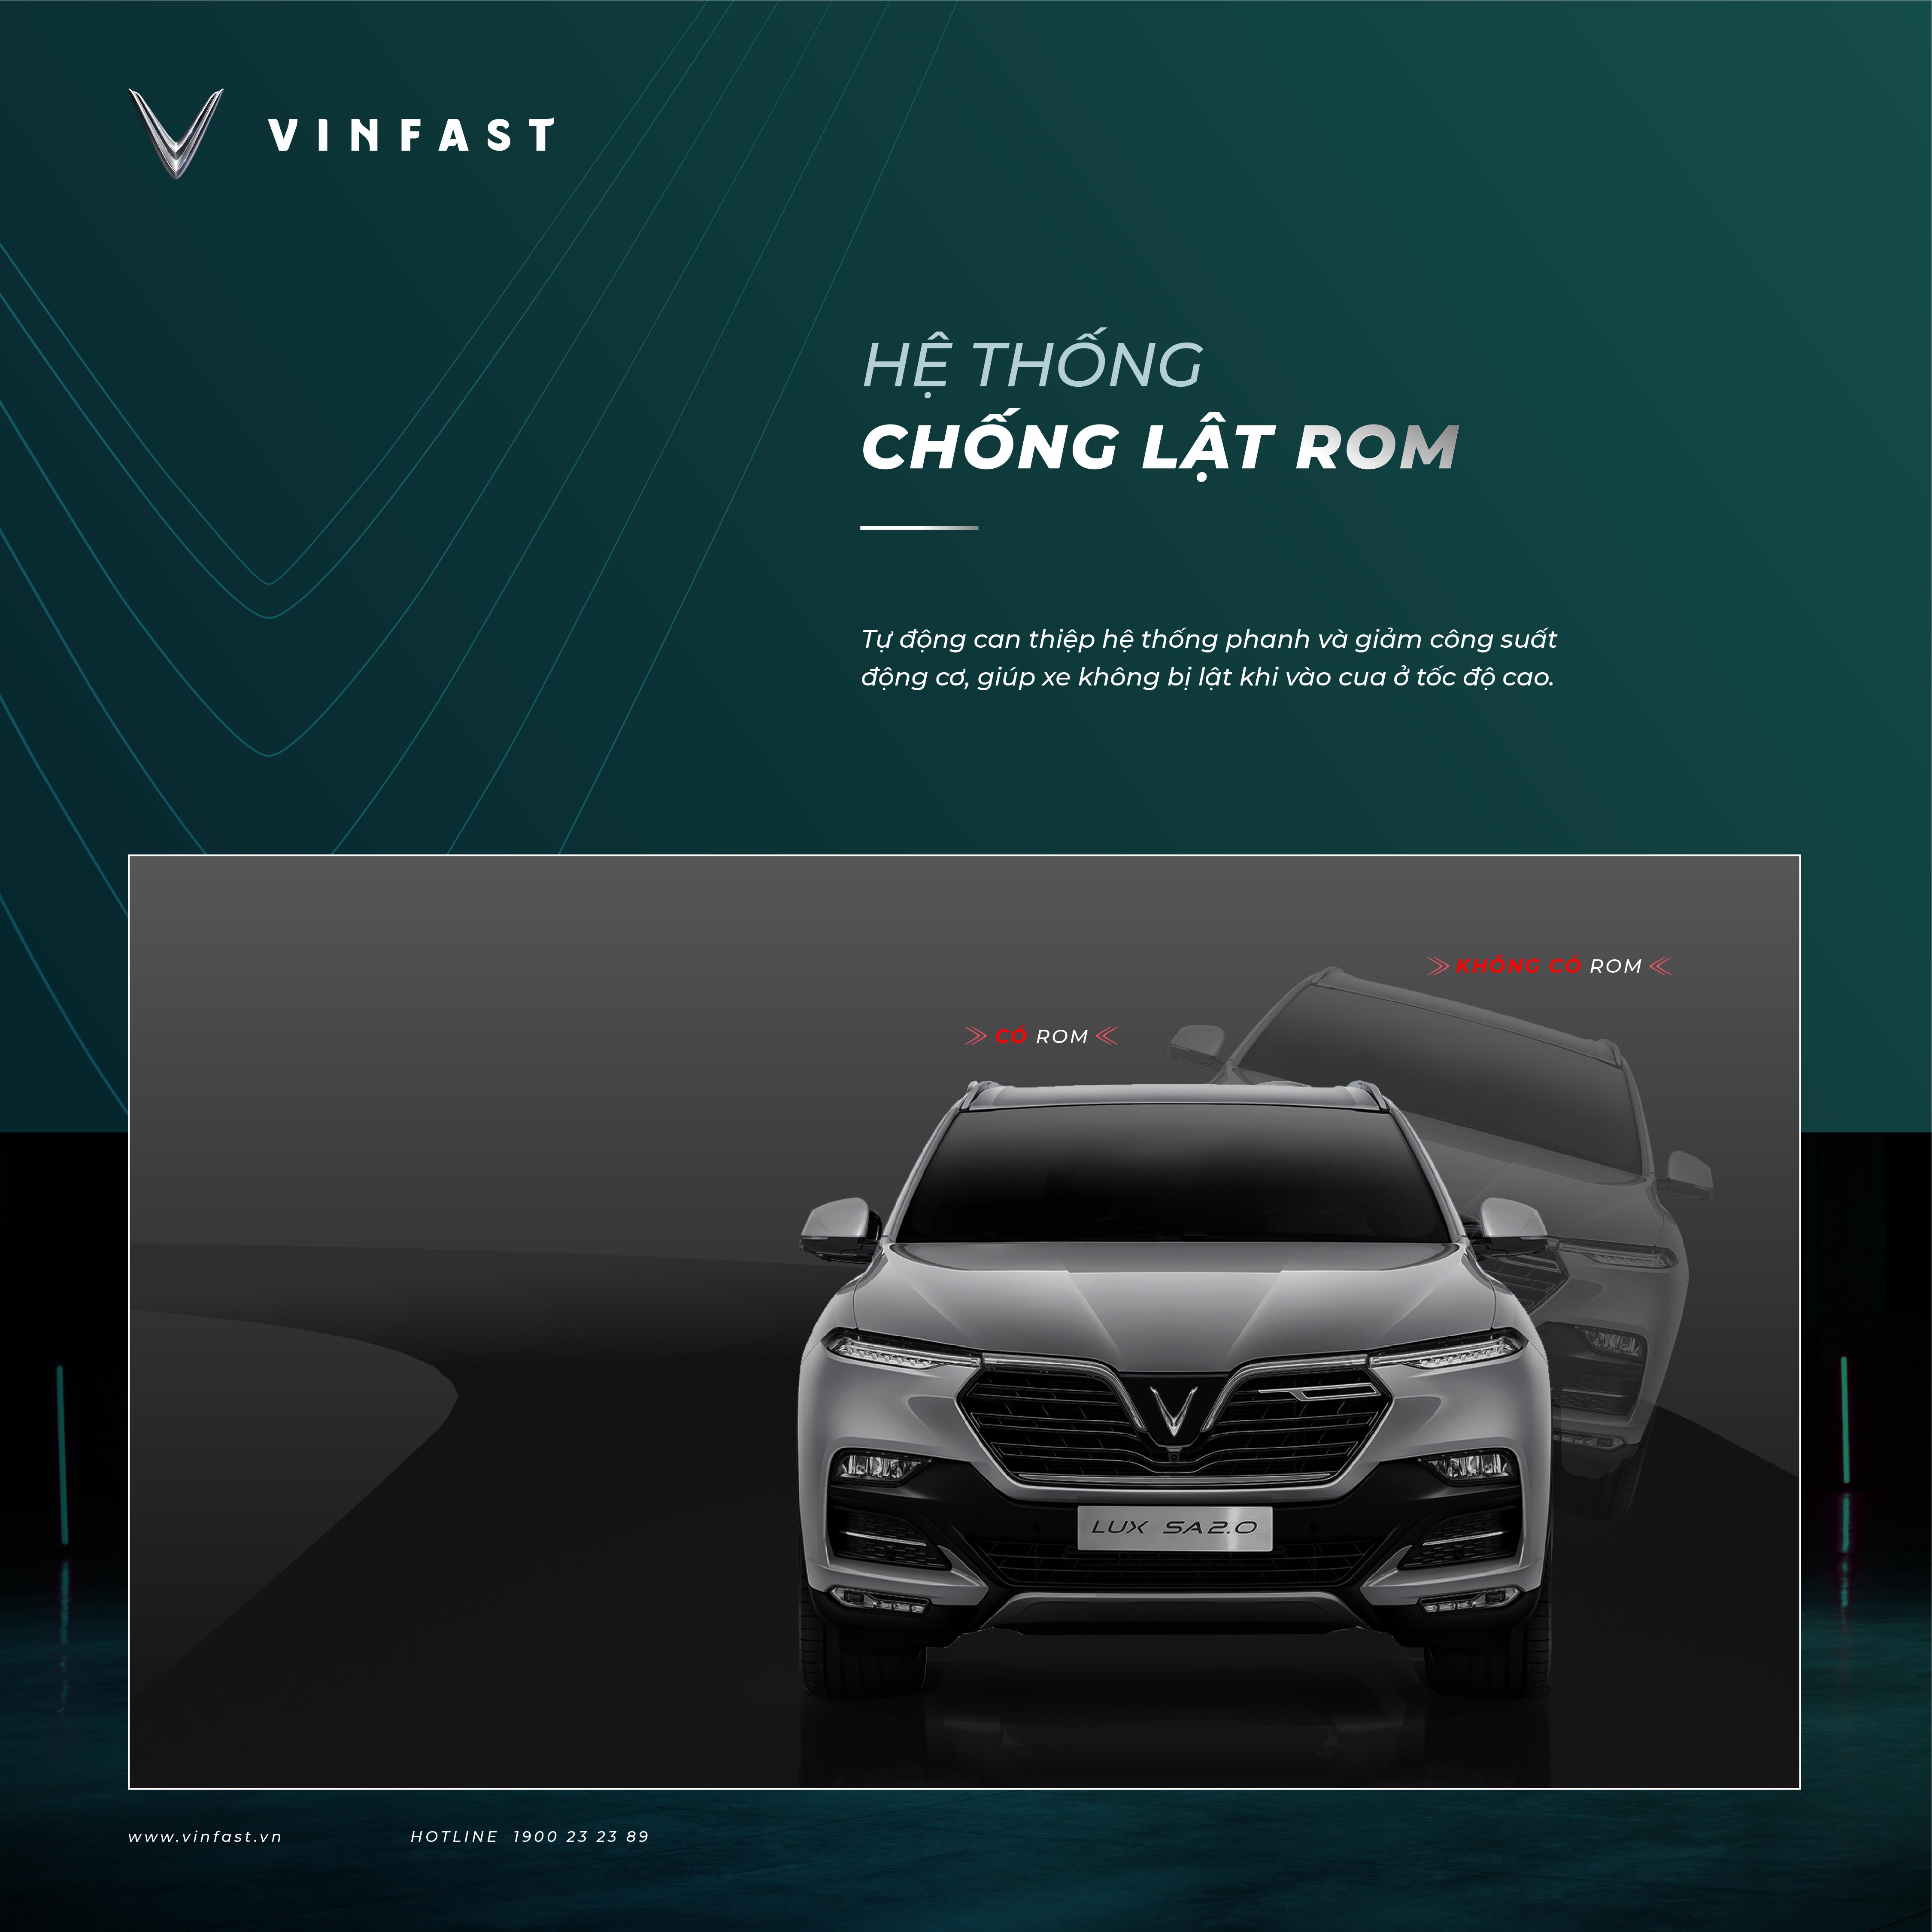 Hinh anh 3 phien ban xe VinFast Lux SA 2.0 khac nhau nhu the nao 7 ok